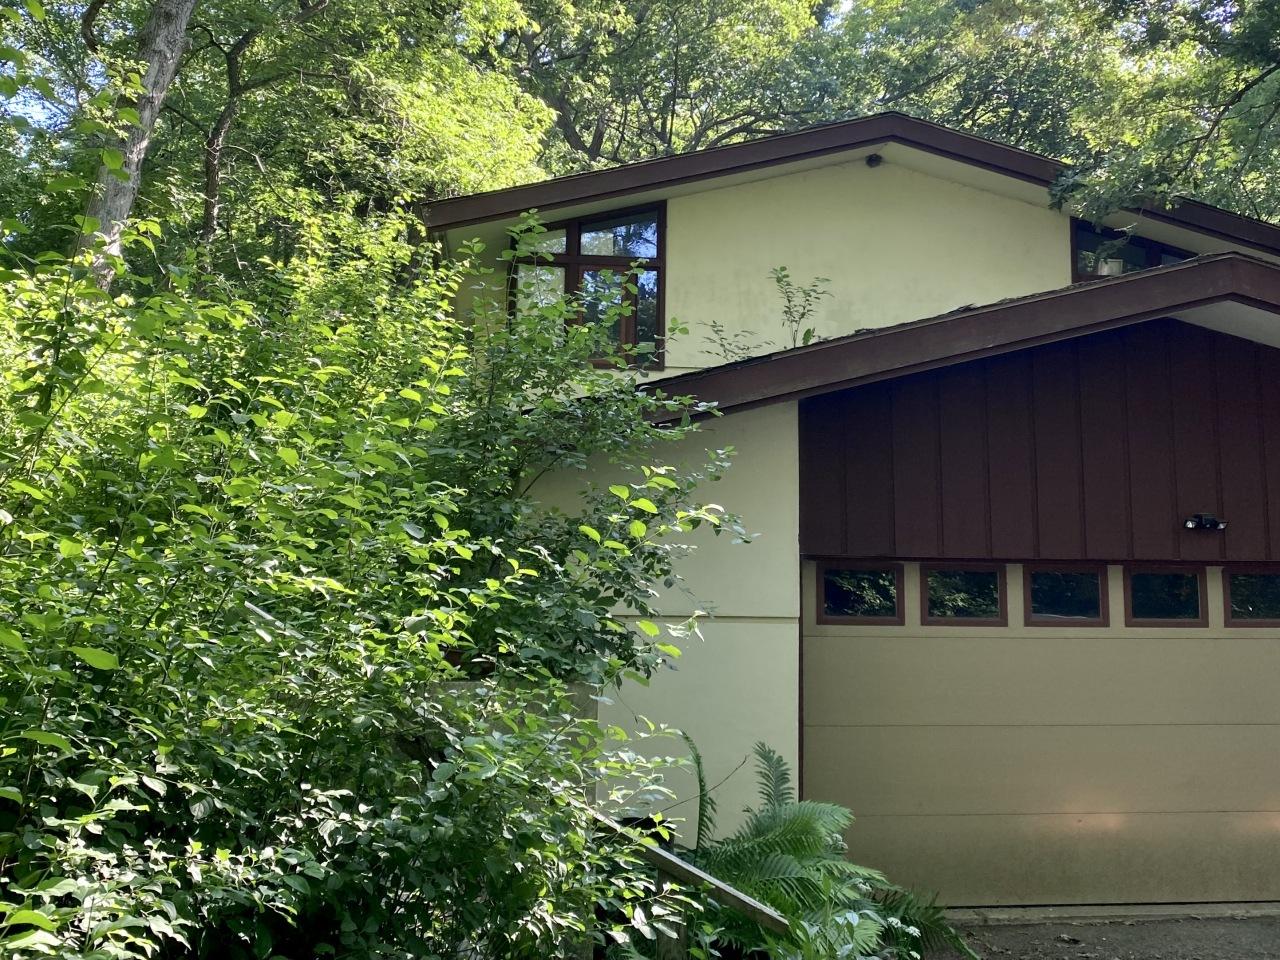 S13W31567 Glacier Pass, Delafield, Wisconsin 53018, 3 Bedrooms Bedrooms, ,1 BathroomBathrooms,Single-Family,For Sale,Glacier Pass,1751489